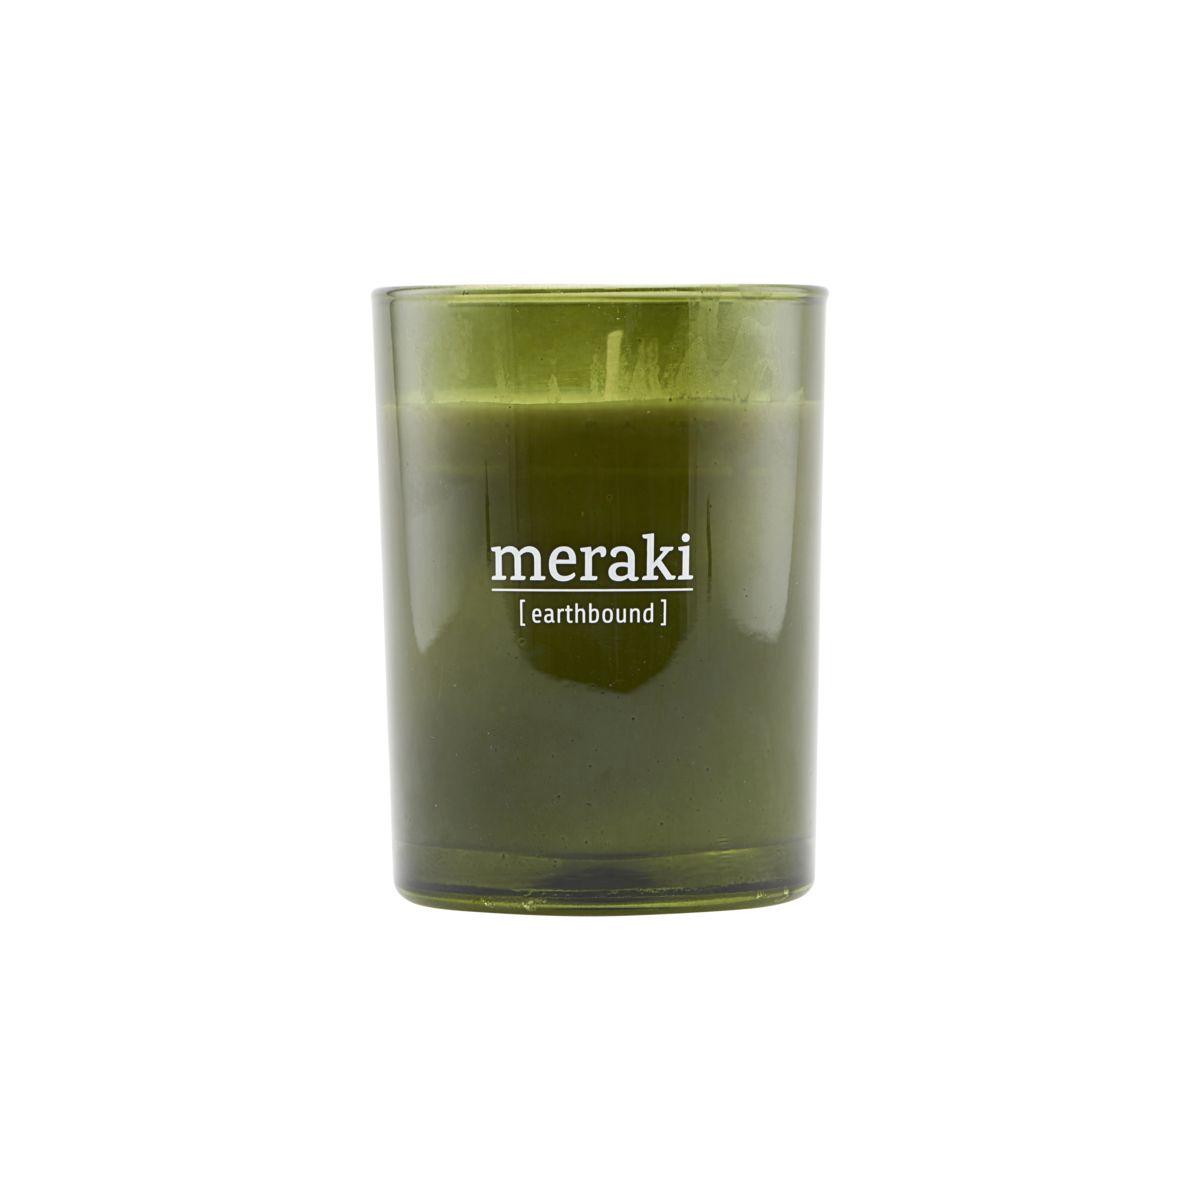 Earthbound Meraki Candle